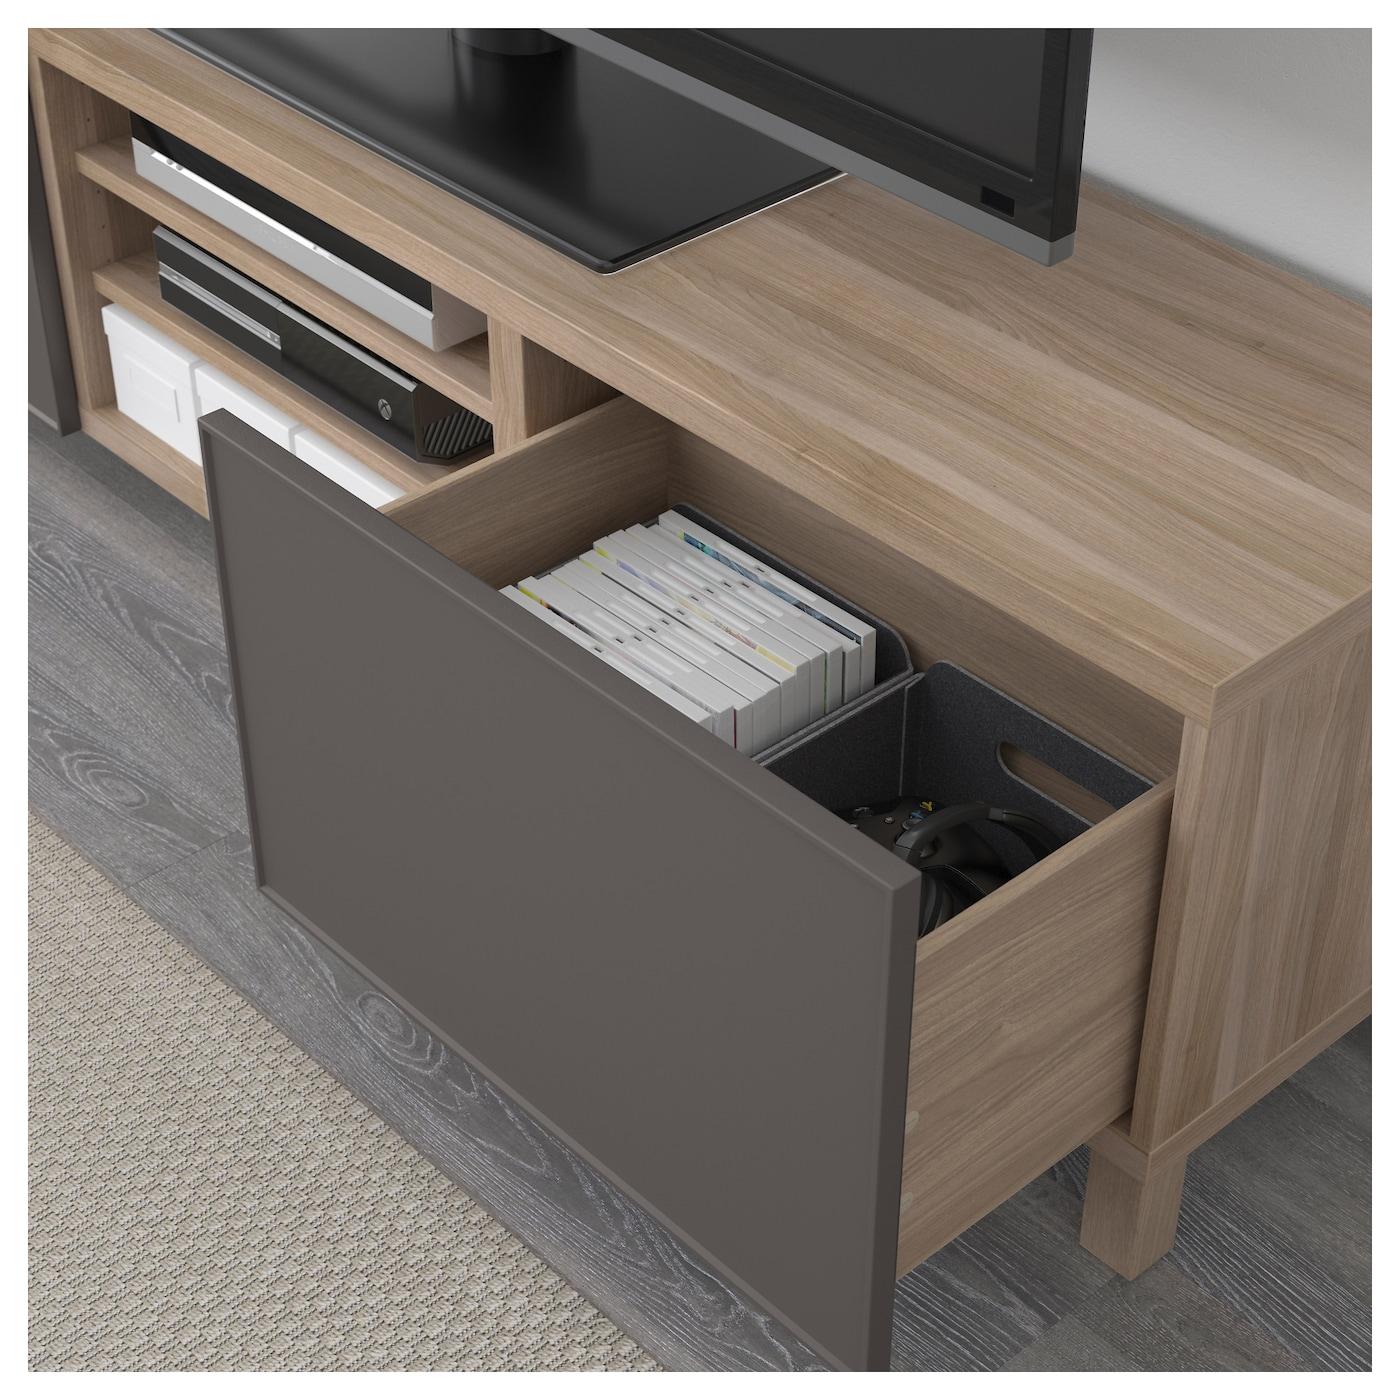 best banc tv avec tiroirs motif noyer teint gris grundsviken gris fonc 180 x 40 x 48 cm ikea. Black Bedroom Furniture Sets. Home Design Ideas